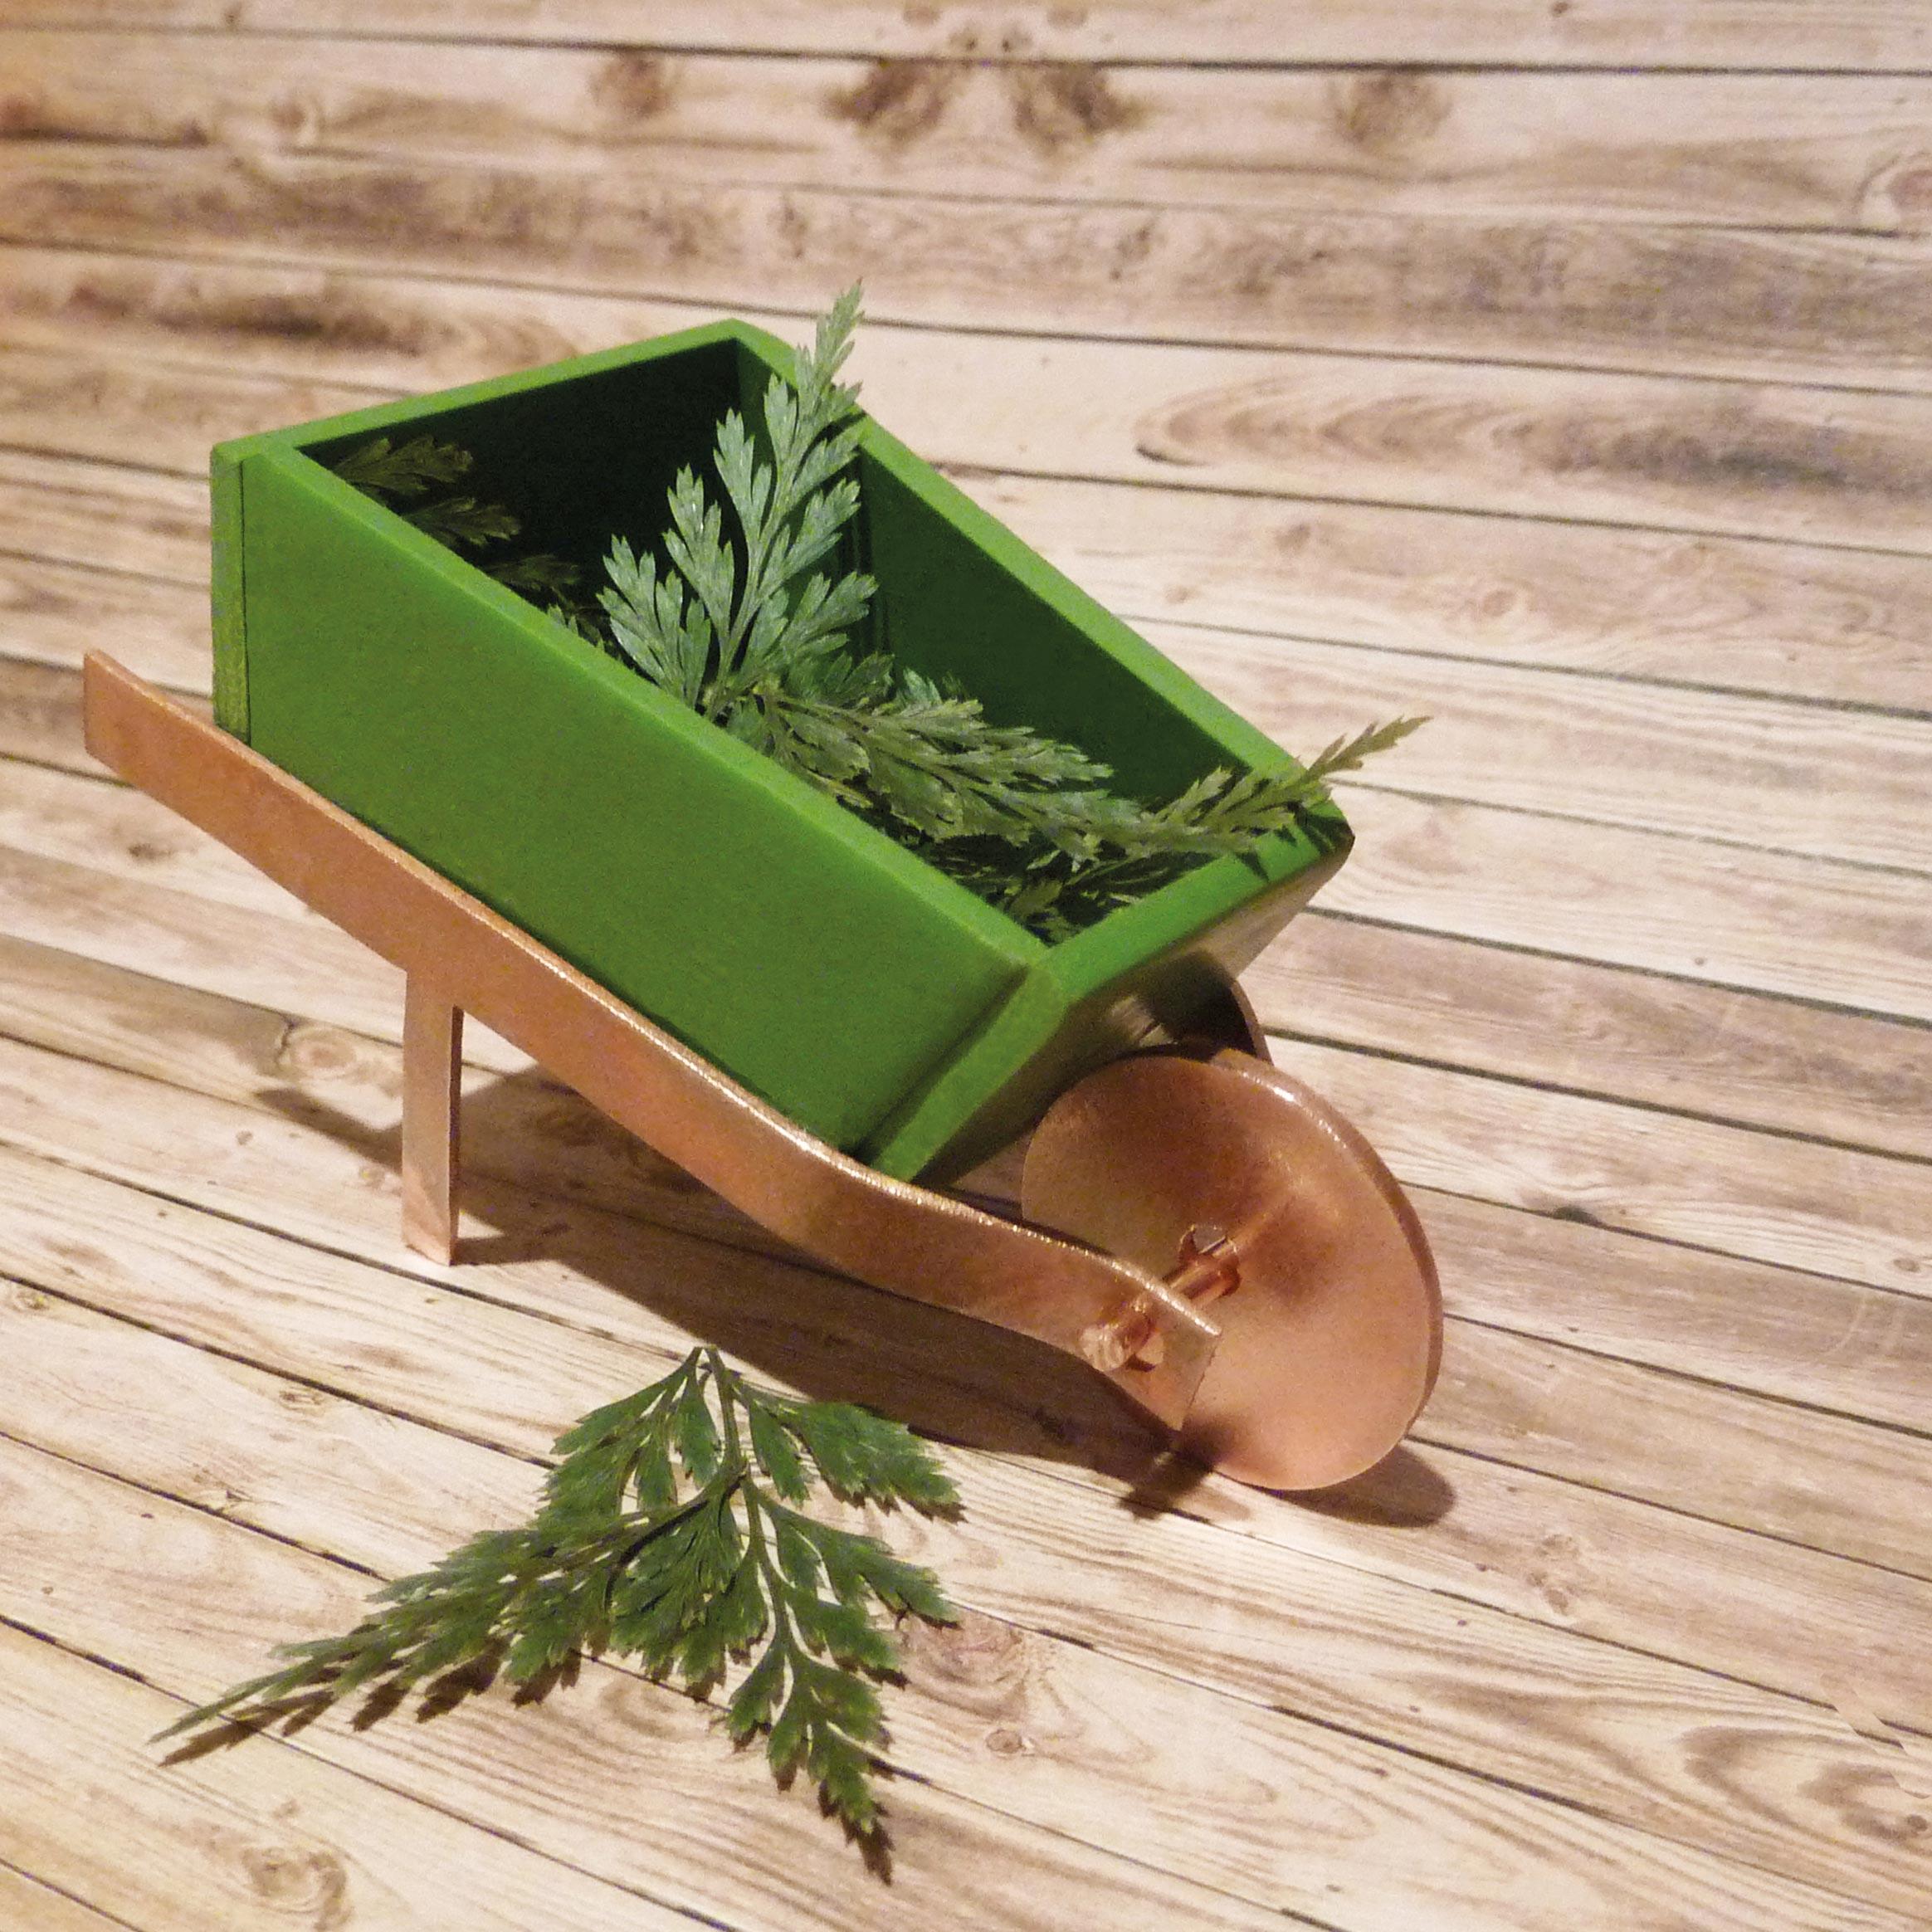 miniature-garden-wheelbarrow